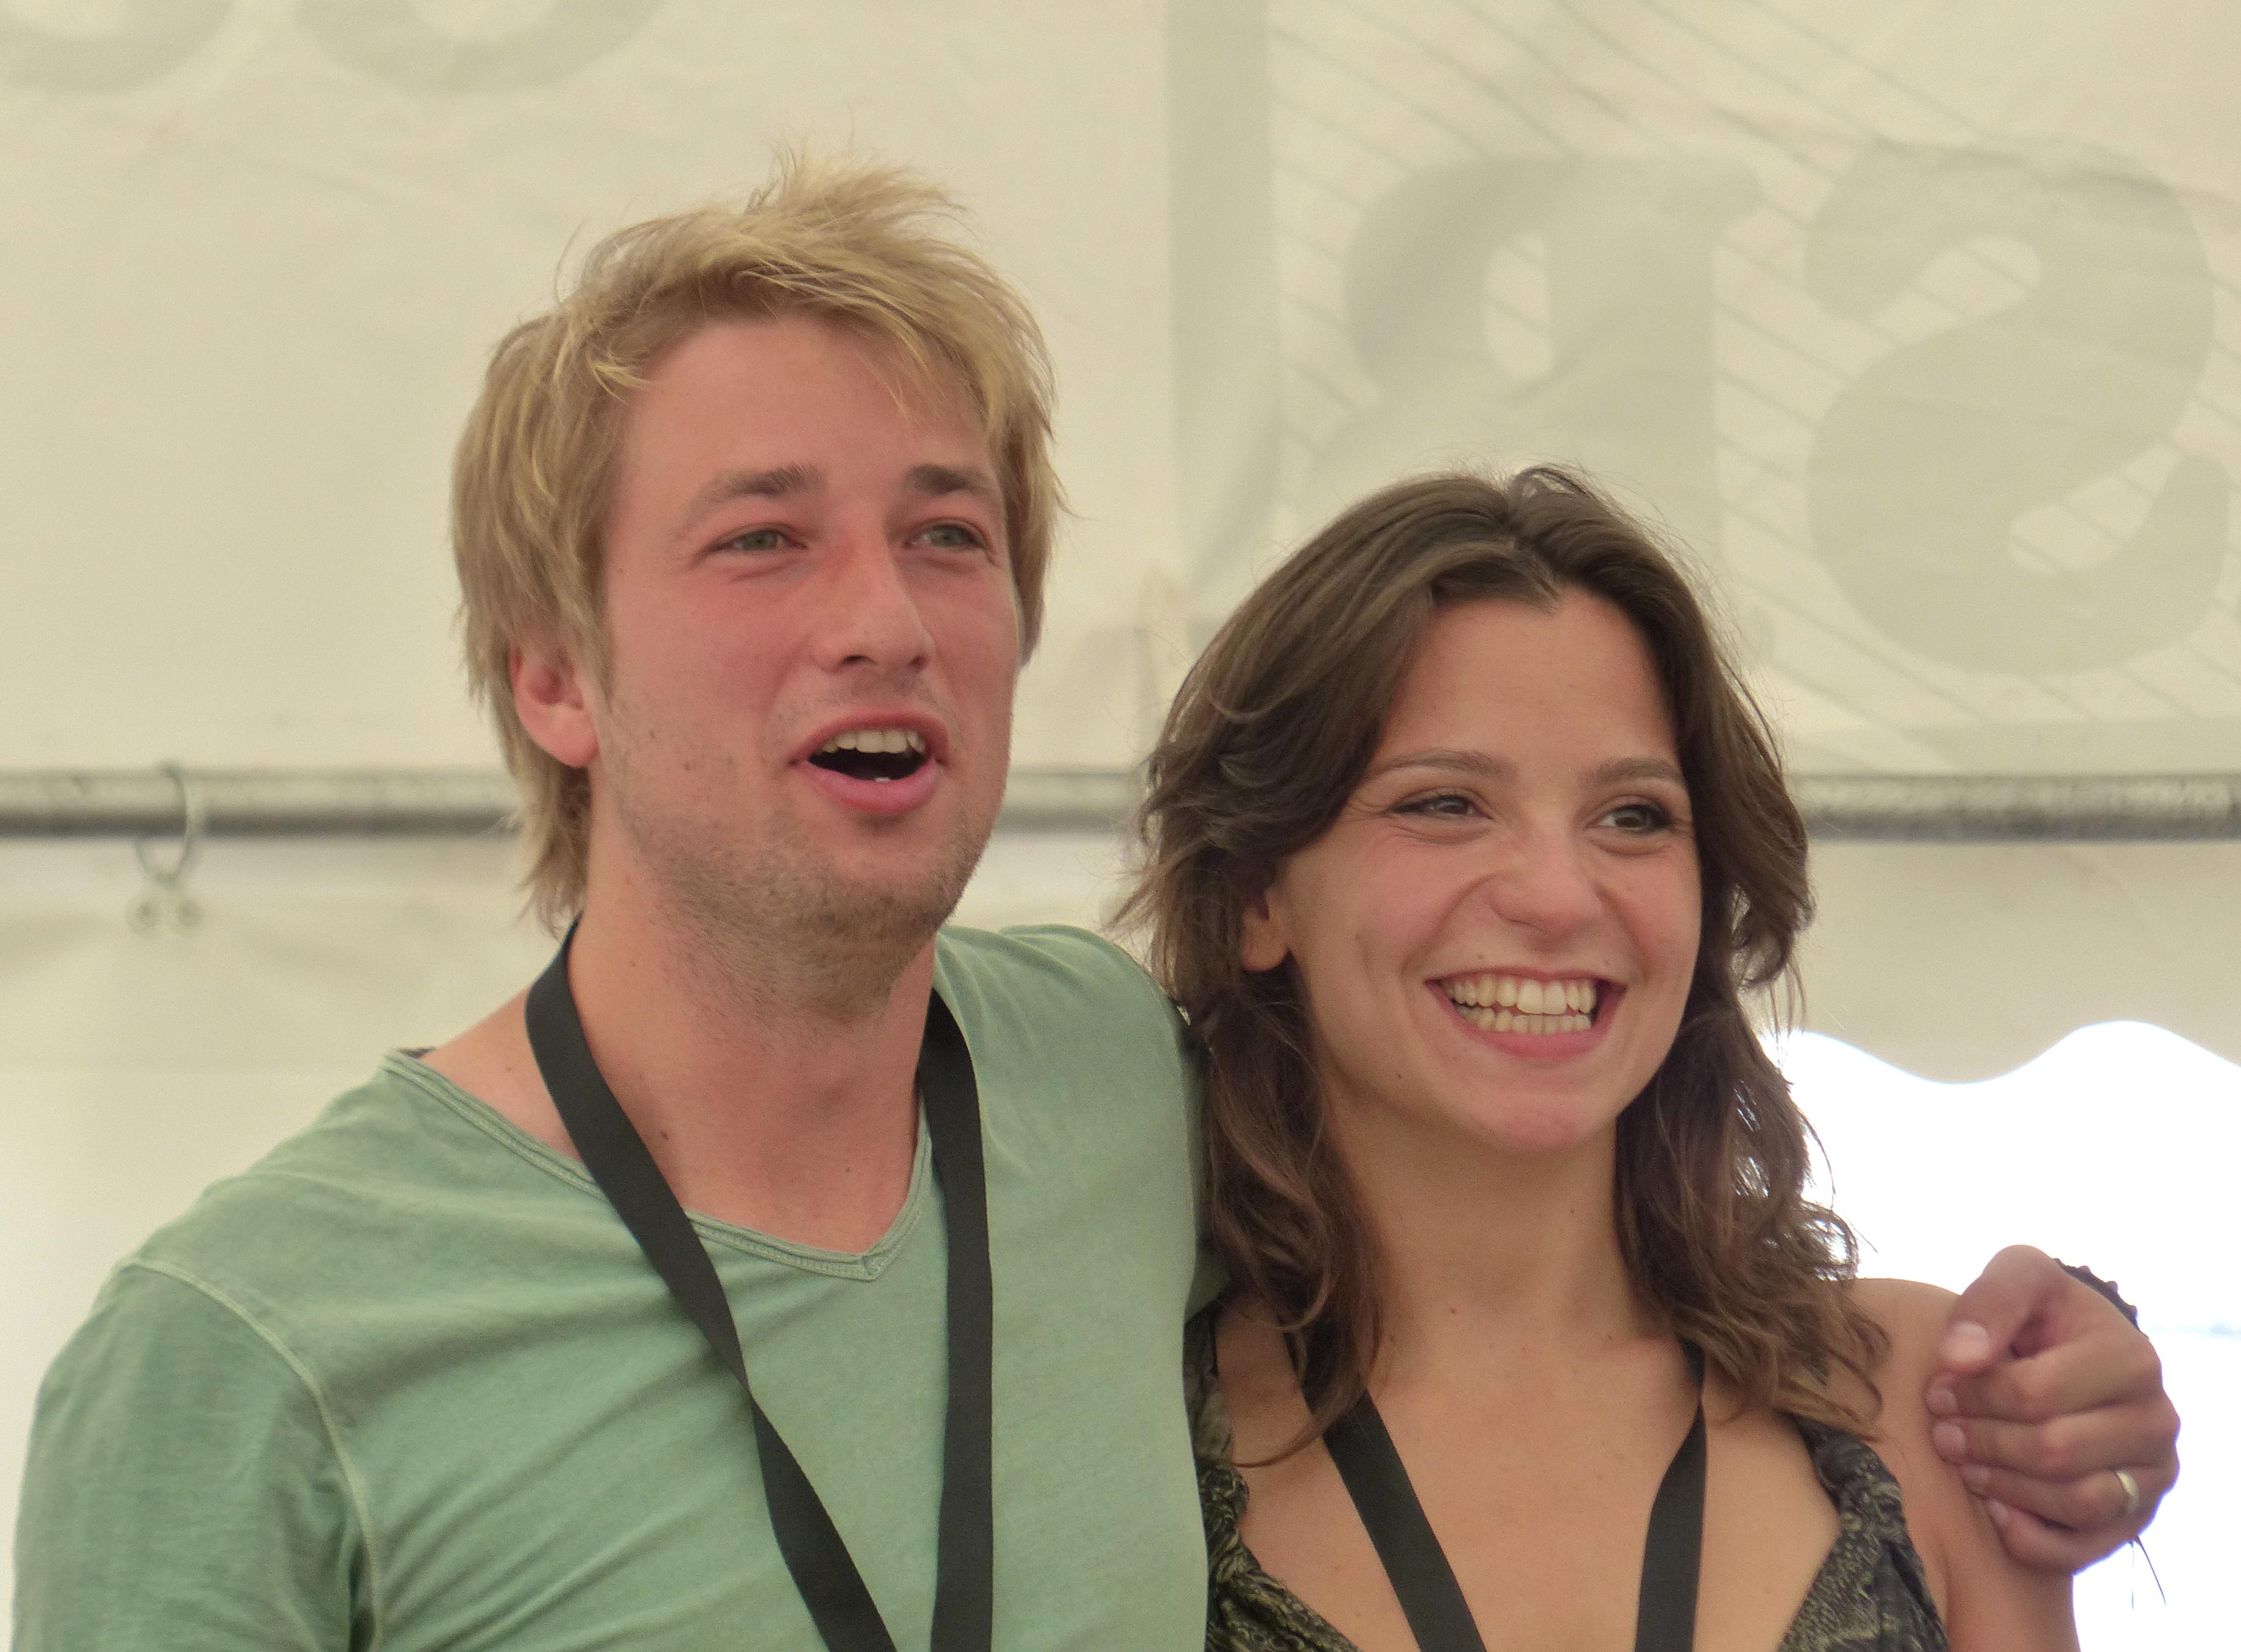 File:Tobias Rosen und Anika Lehmann.JPG